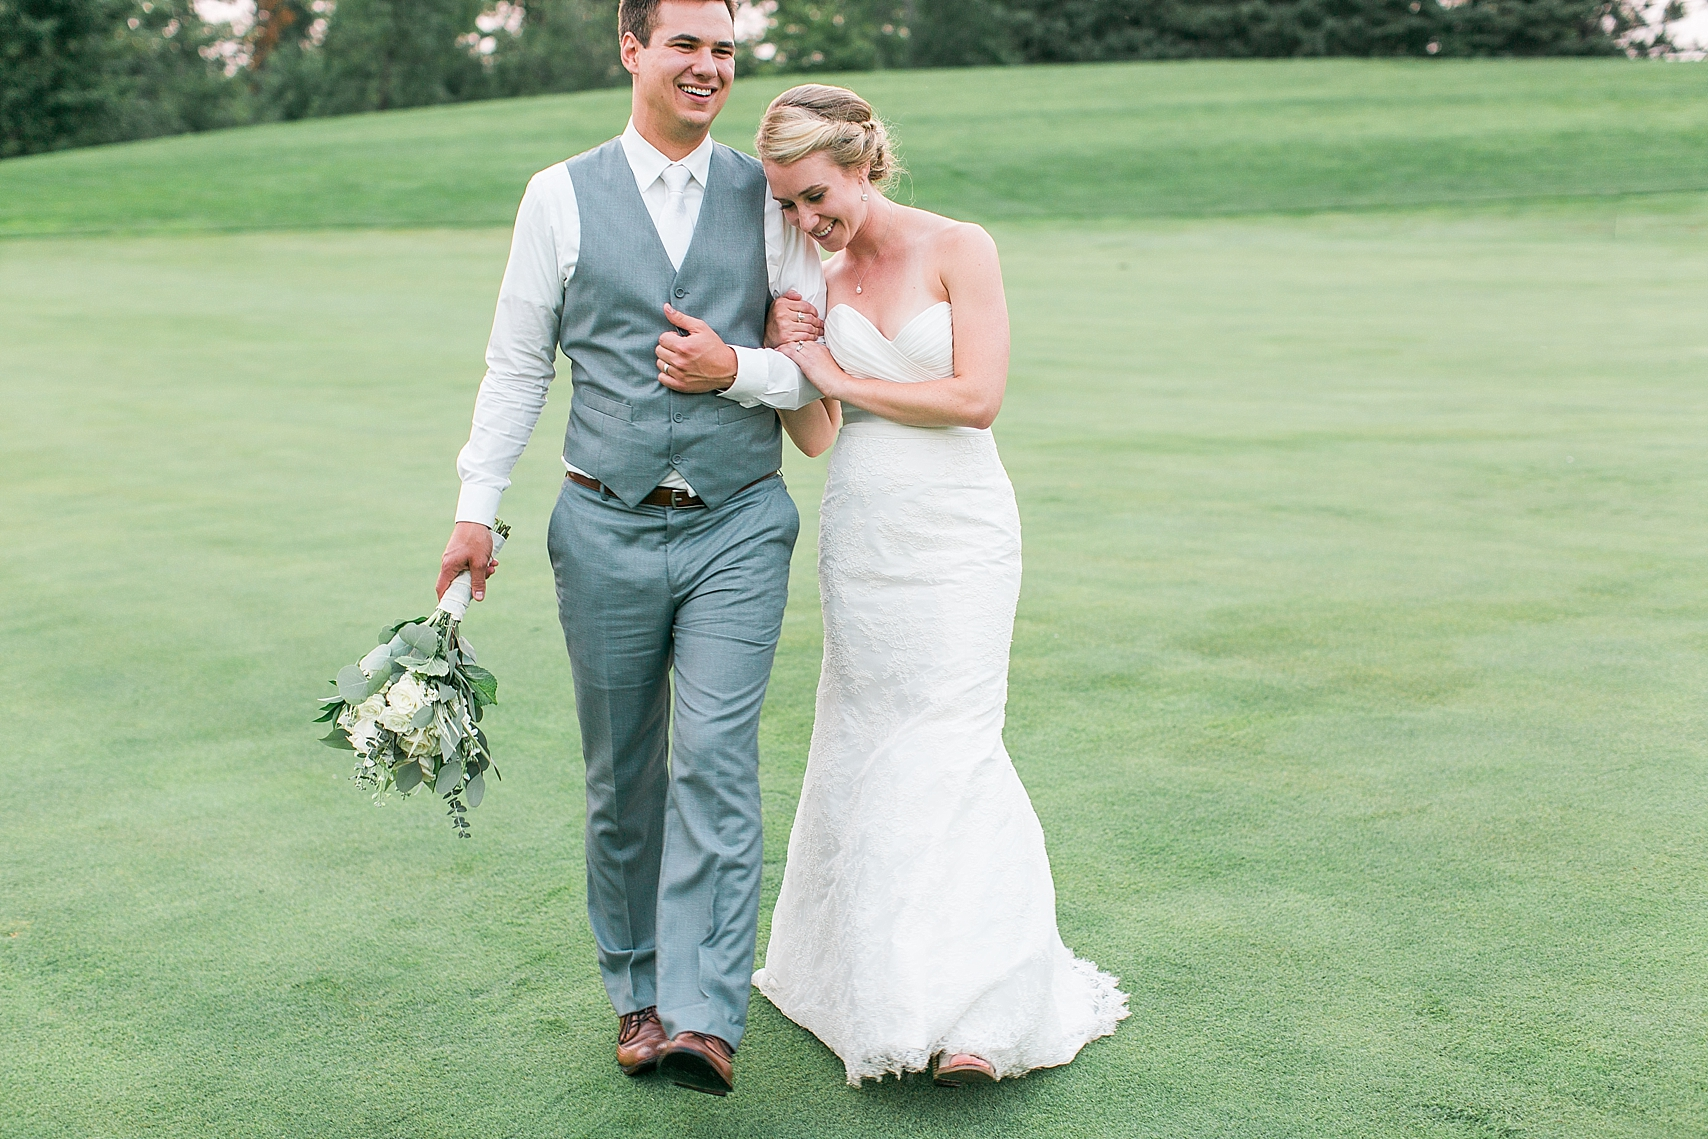 Minnesota Minneapolis Wedding Photographer Best Of 2018 Weddings Mallory Kiesow Photography_0072.jpg